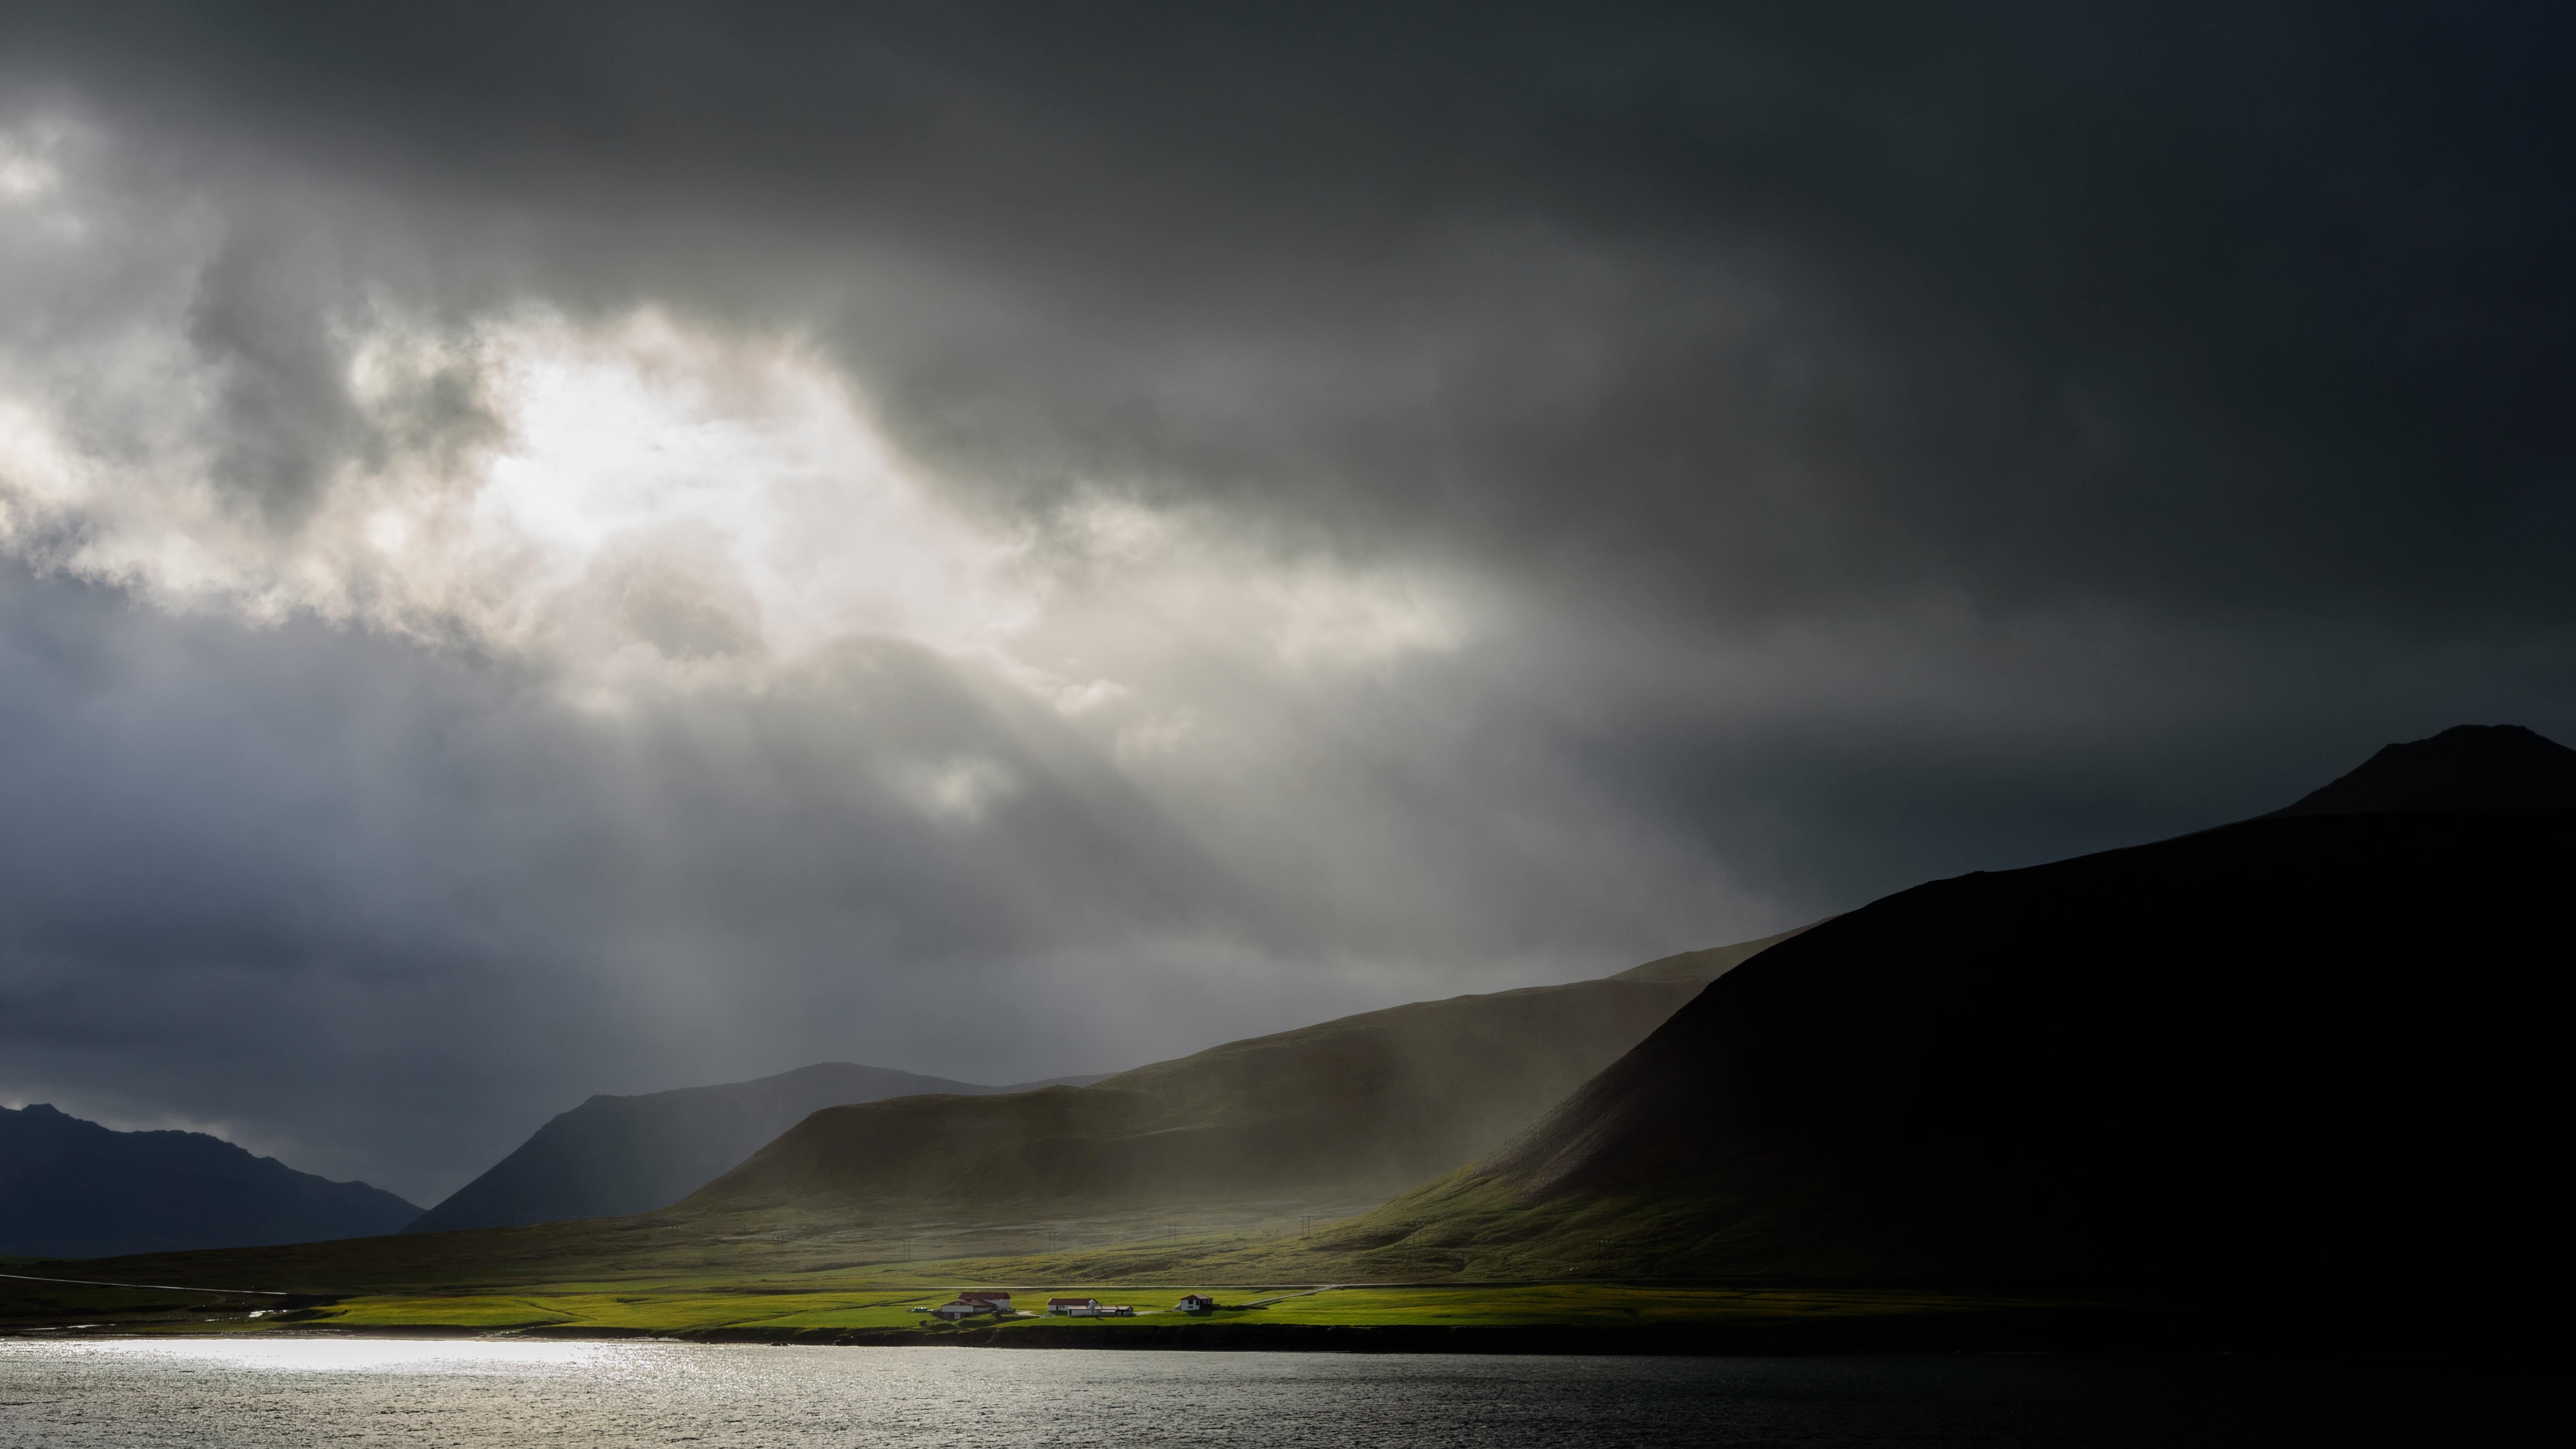 sunlight passing gray cloudy sky